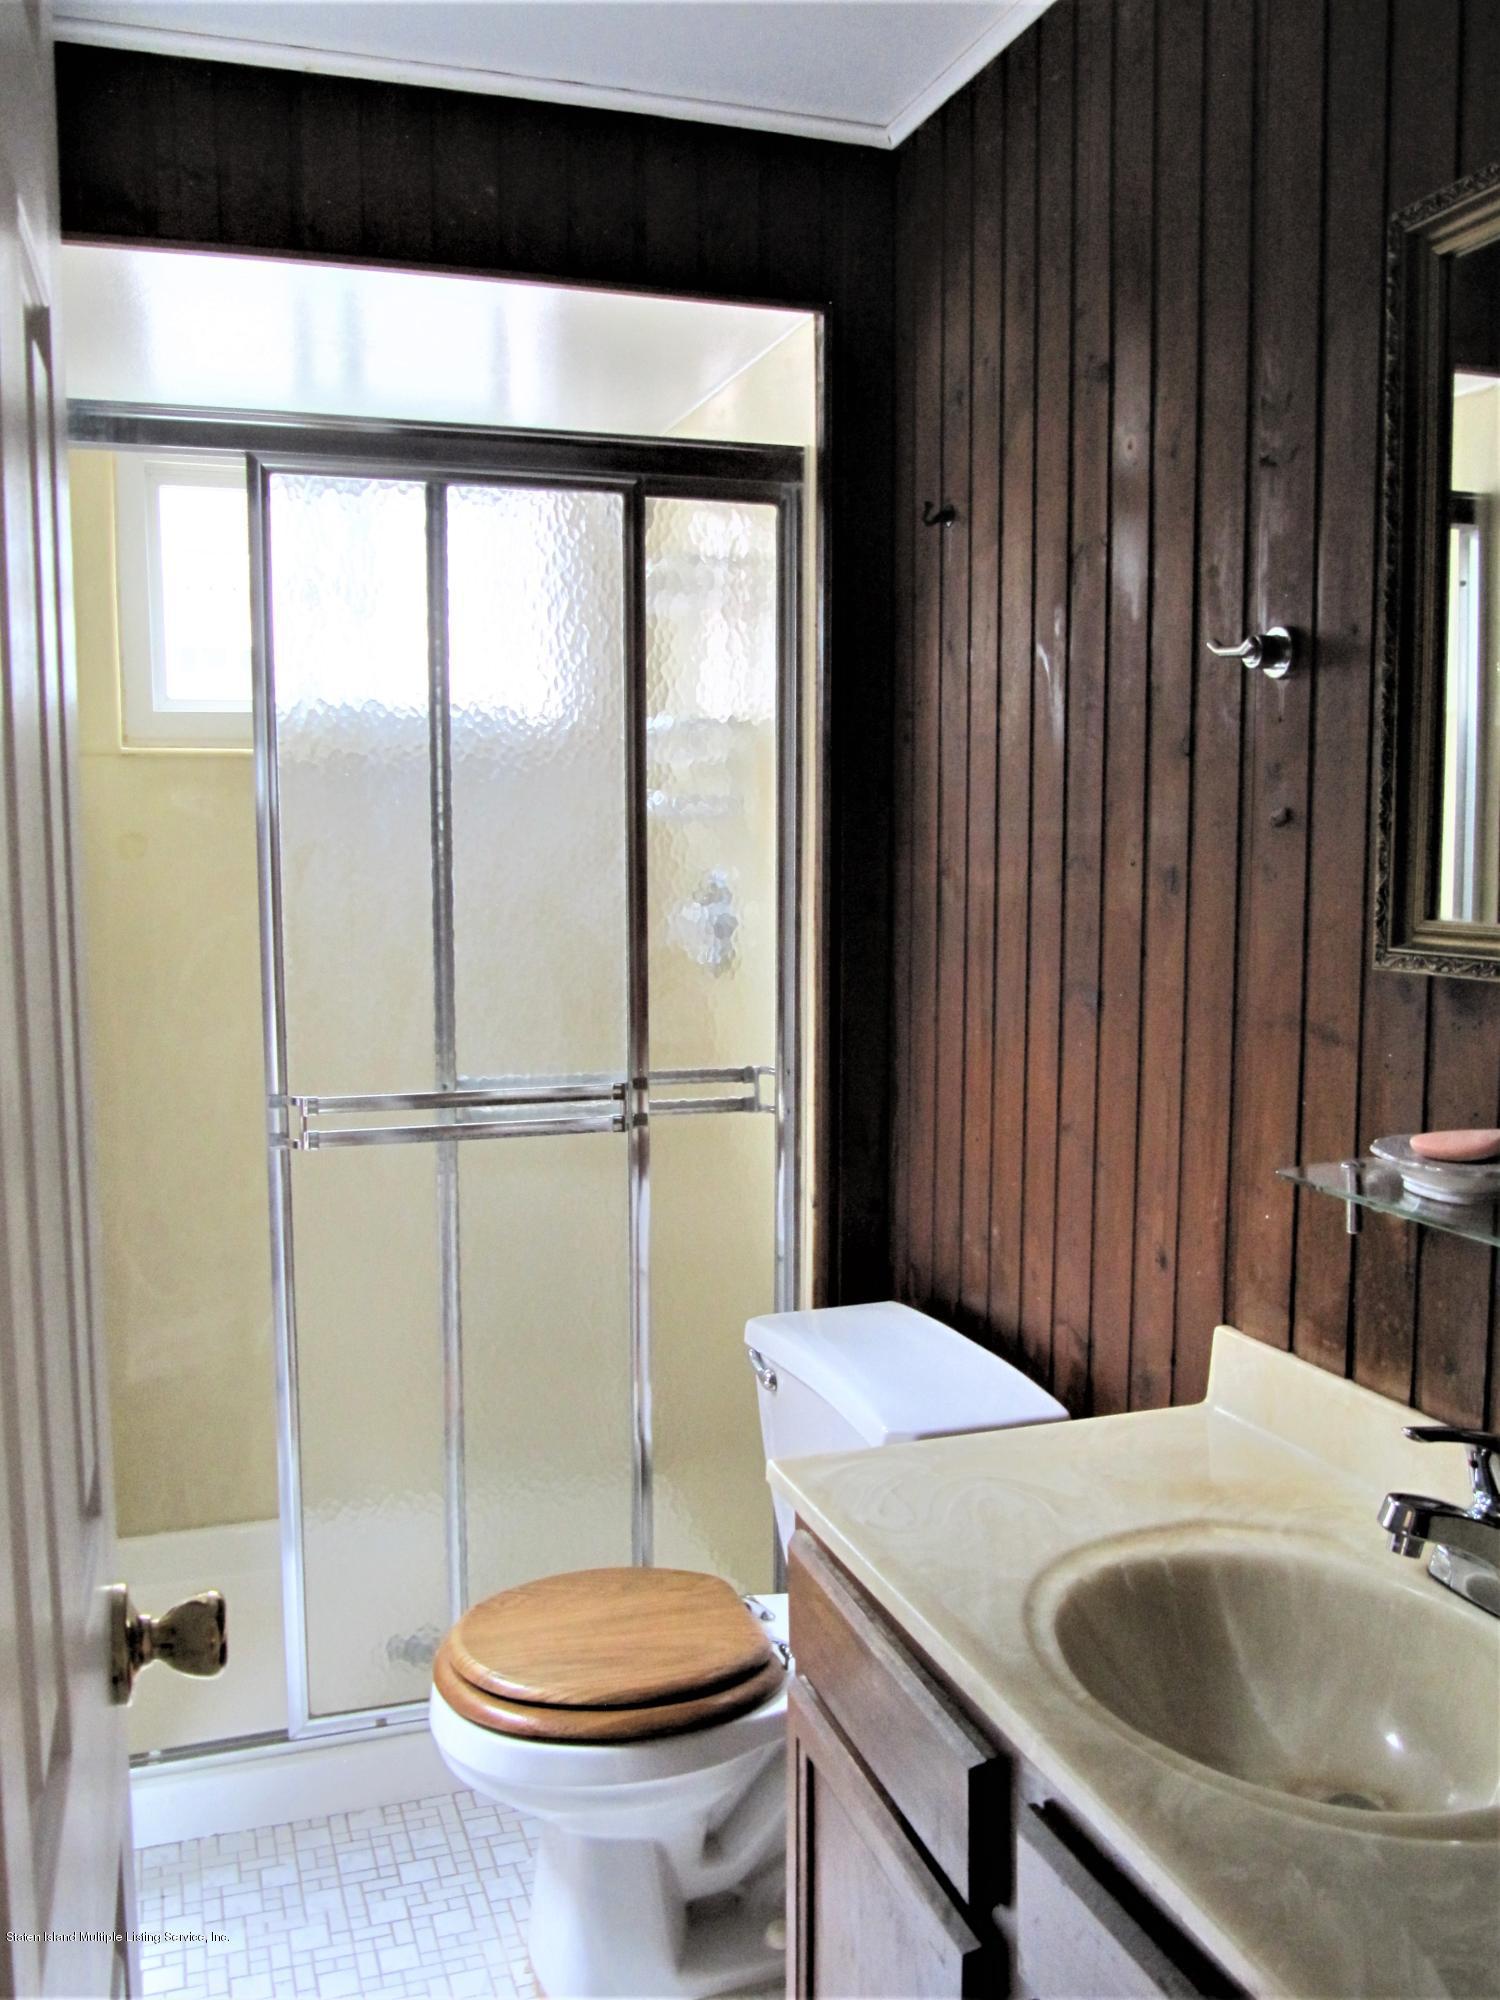 88 Green Valley Rd Staten Island,New York,10312,United States,3 Bedrooms Bedrooms,7 Rooms Rooms,3 BathroomsBathrooms,Res-Rental,Green Valley Rd,1132969